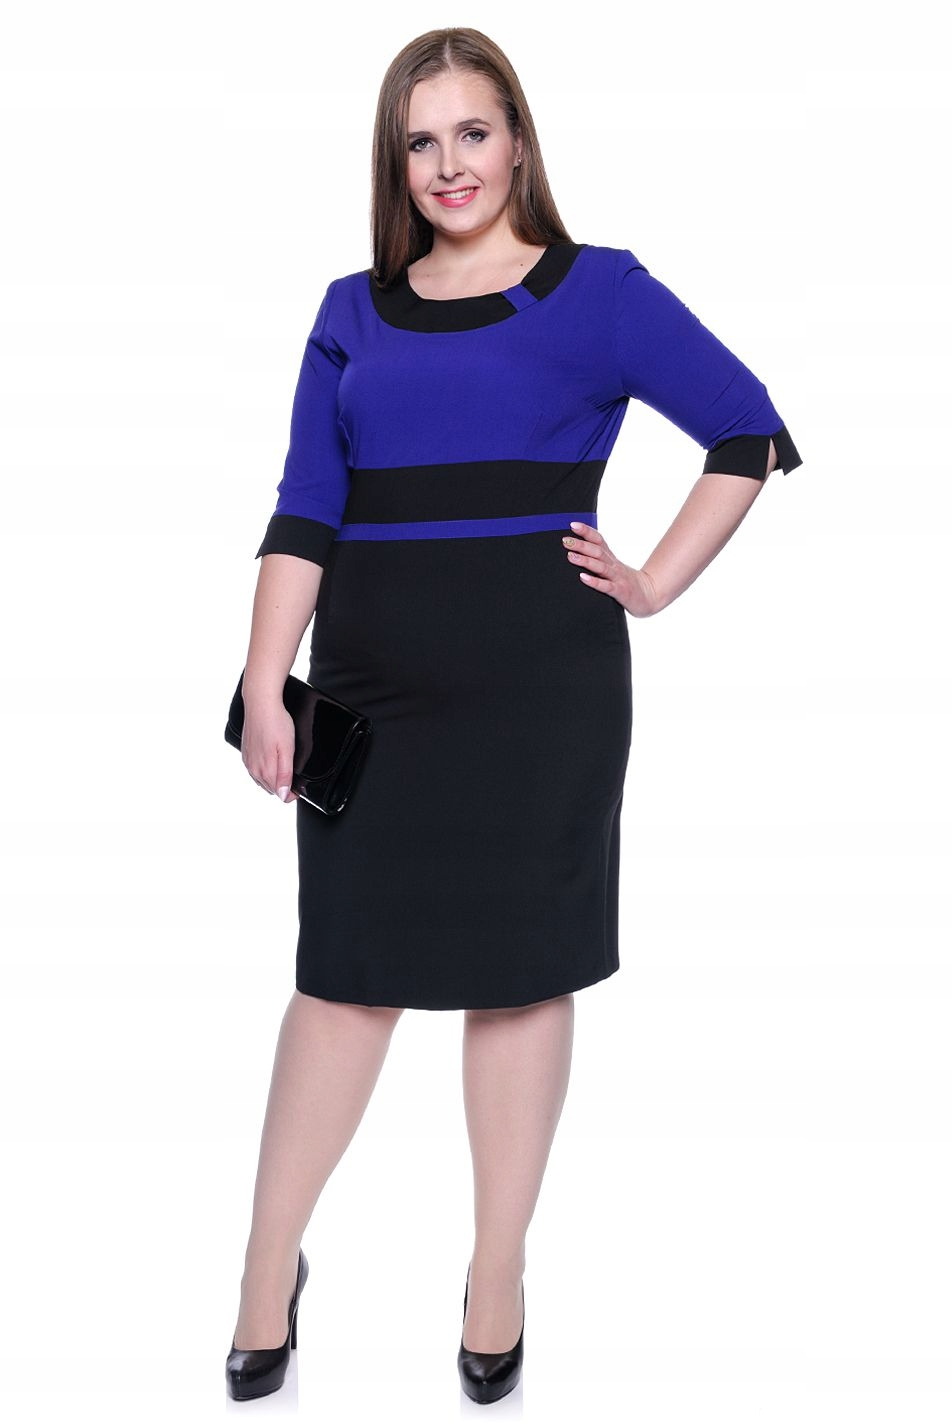 165ce28d4404 Chabrowo-czarna elegancka sukienka 56 - 7464018127 - oficjalne ...